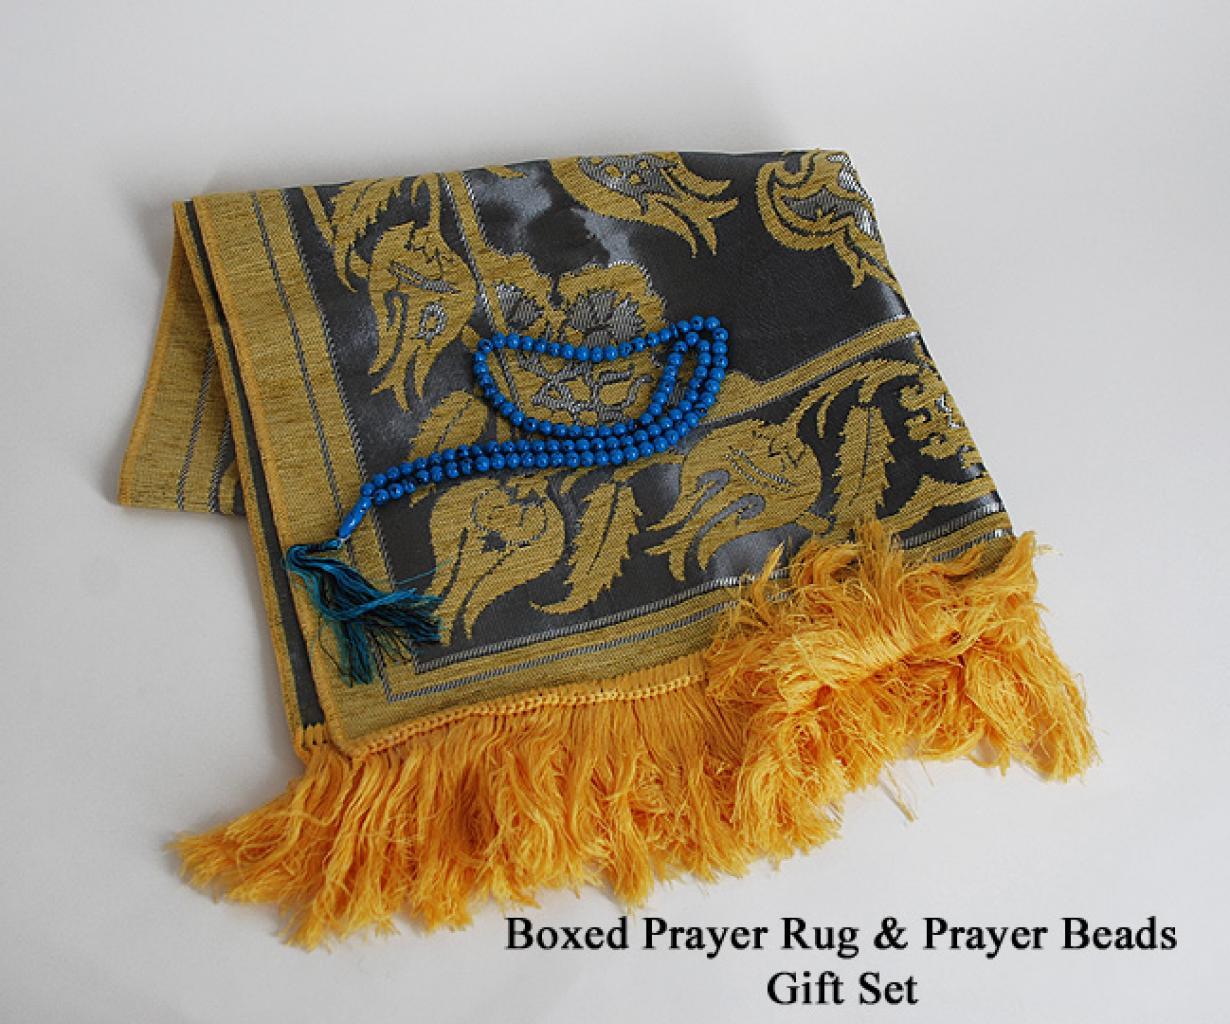 Boxed Premium velour woven prayer rug with Beads gift set ii640